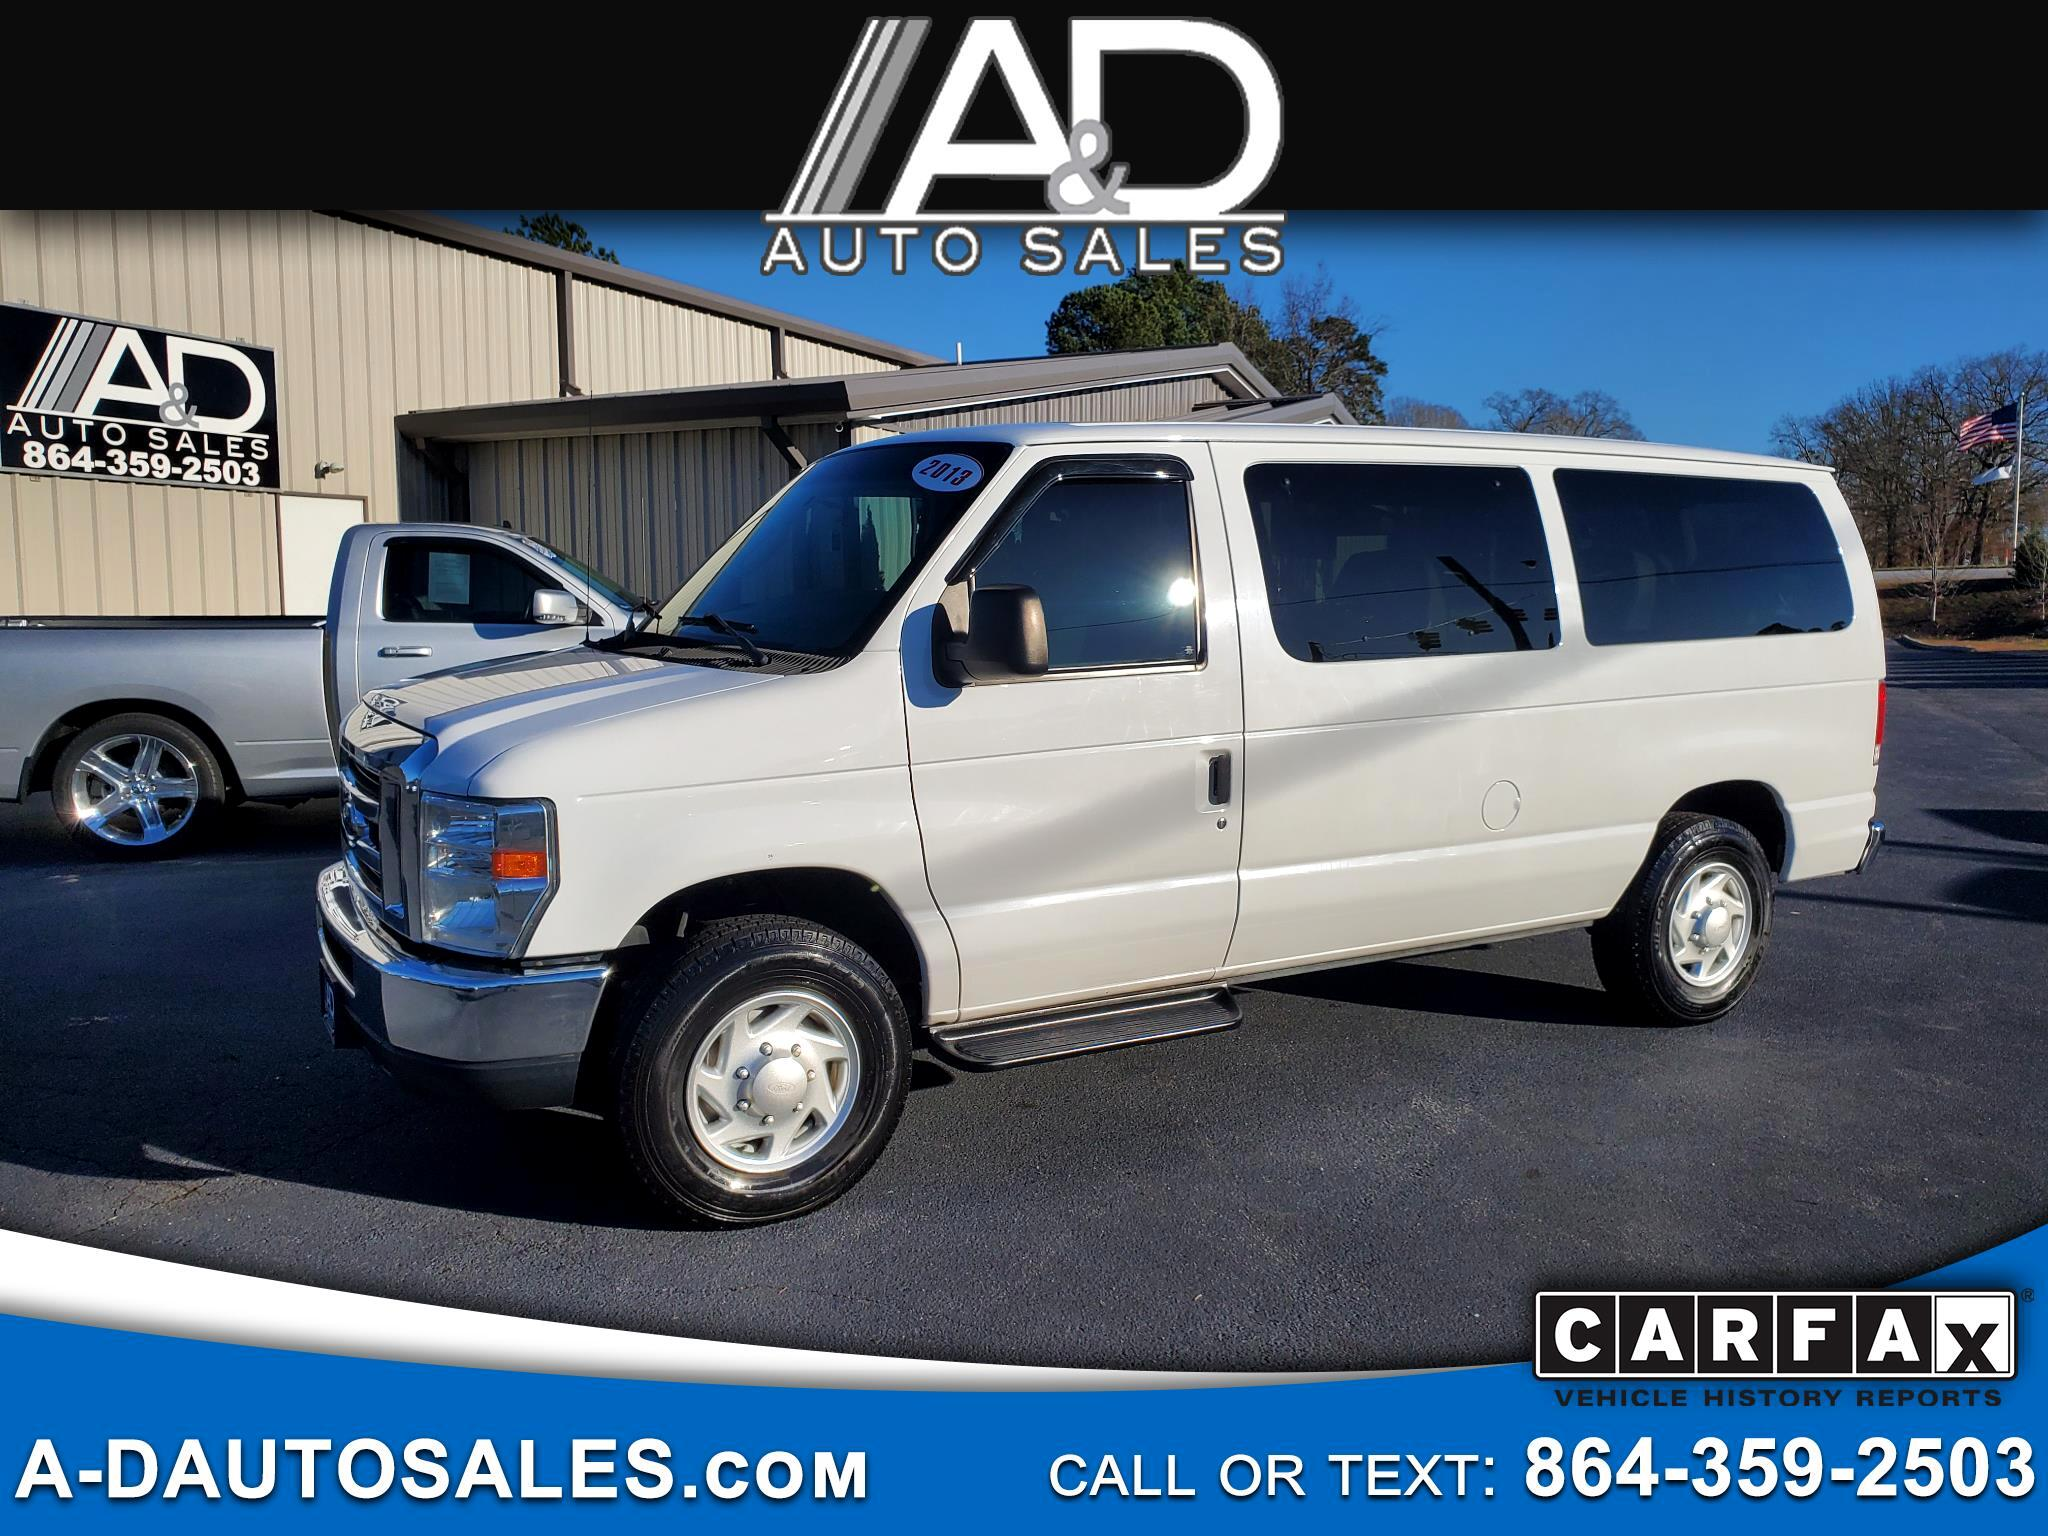 Ford Econoline Wagon E-150 XLT 2013